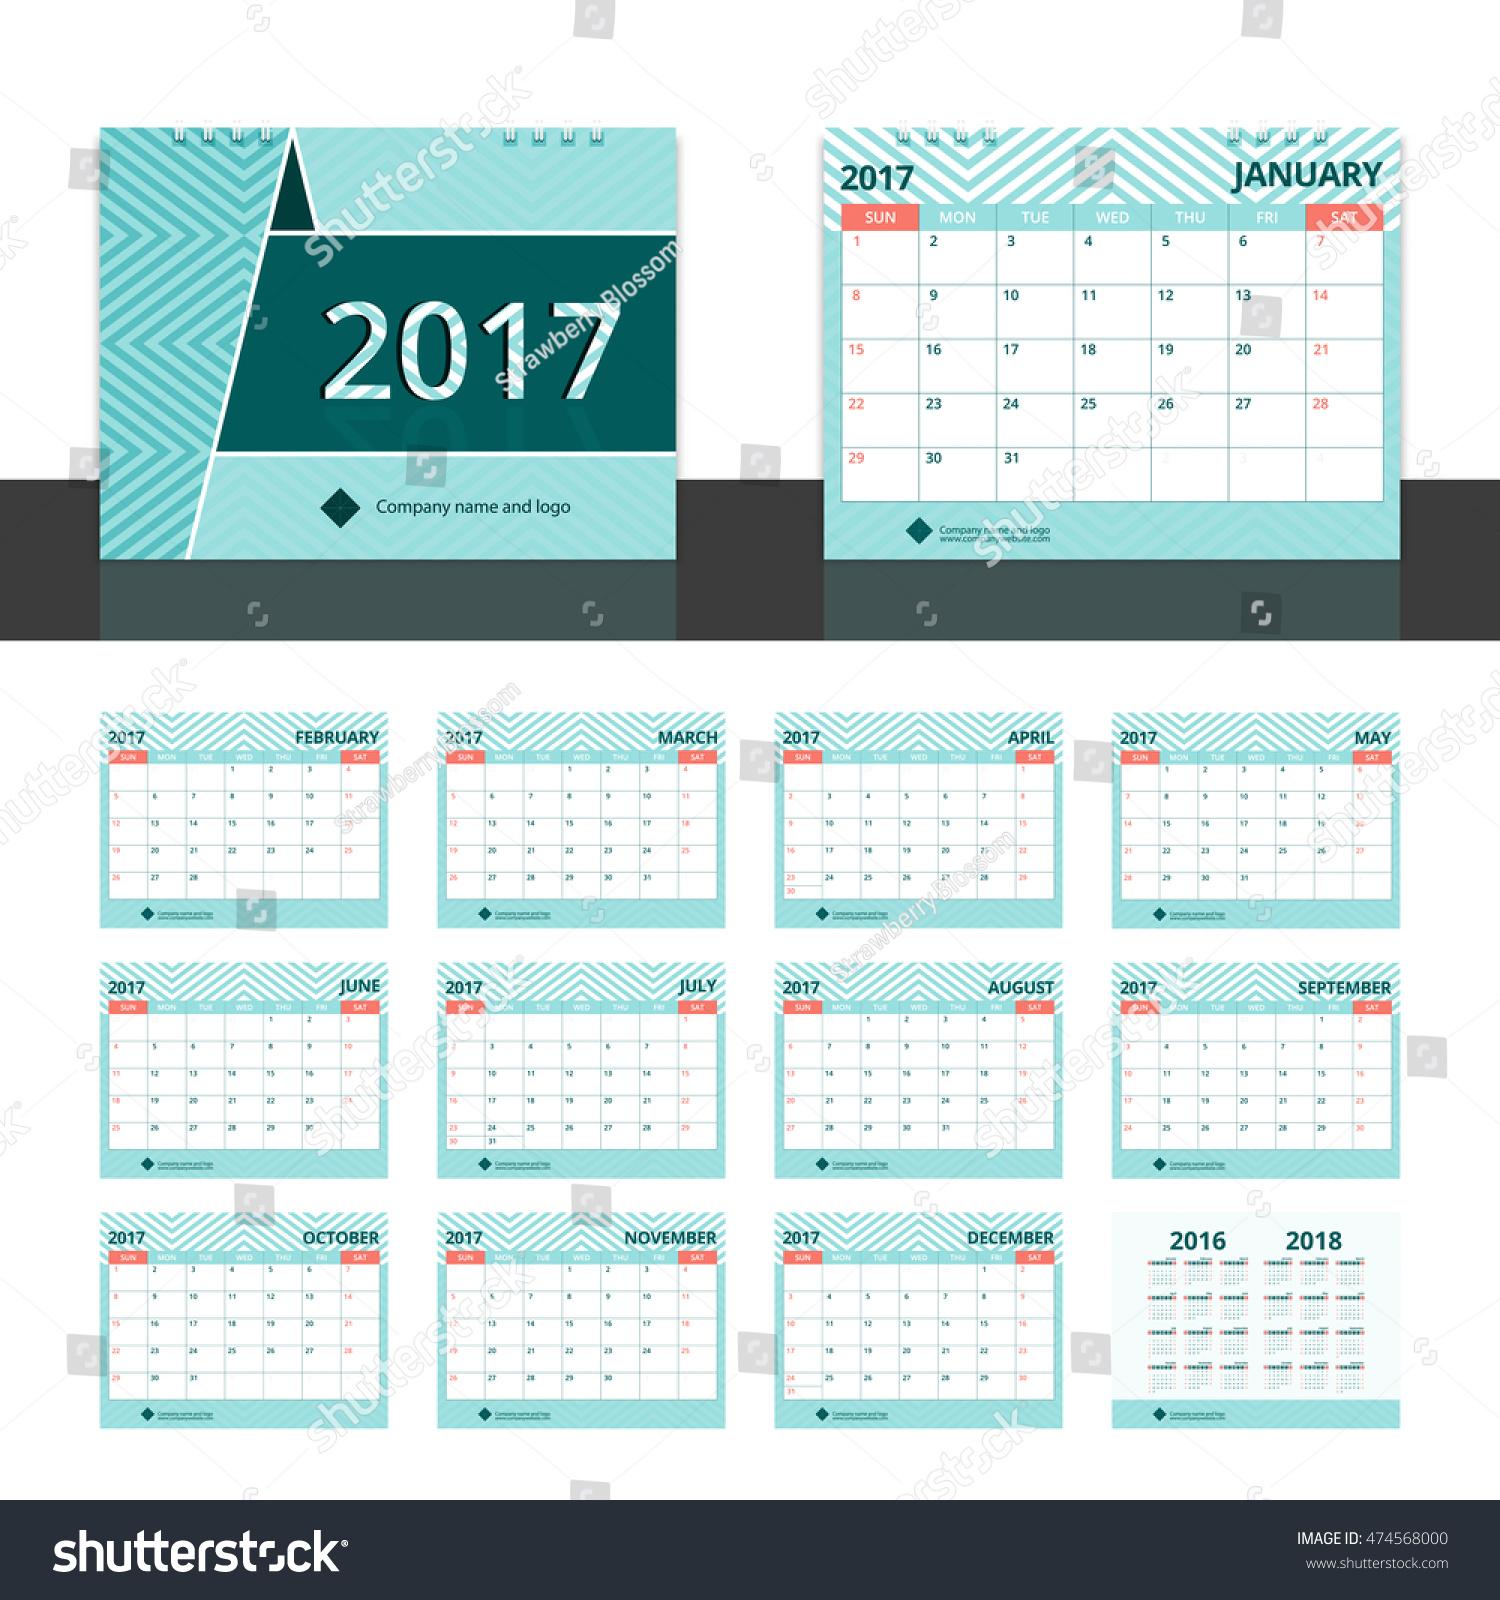 Corporate Calendar 2017 : Desk calendar corporate business planner stock vector